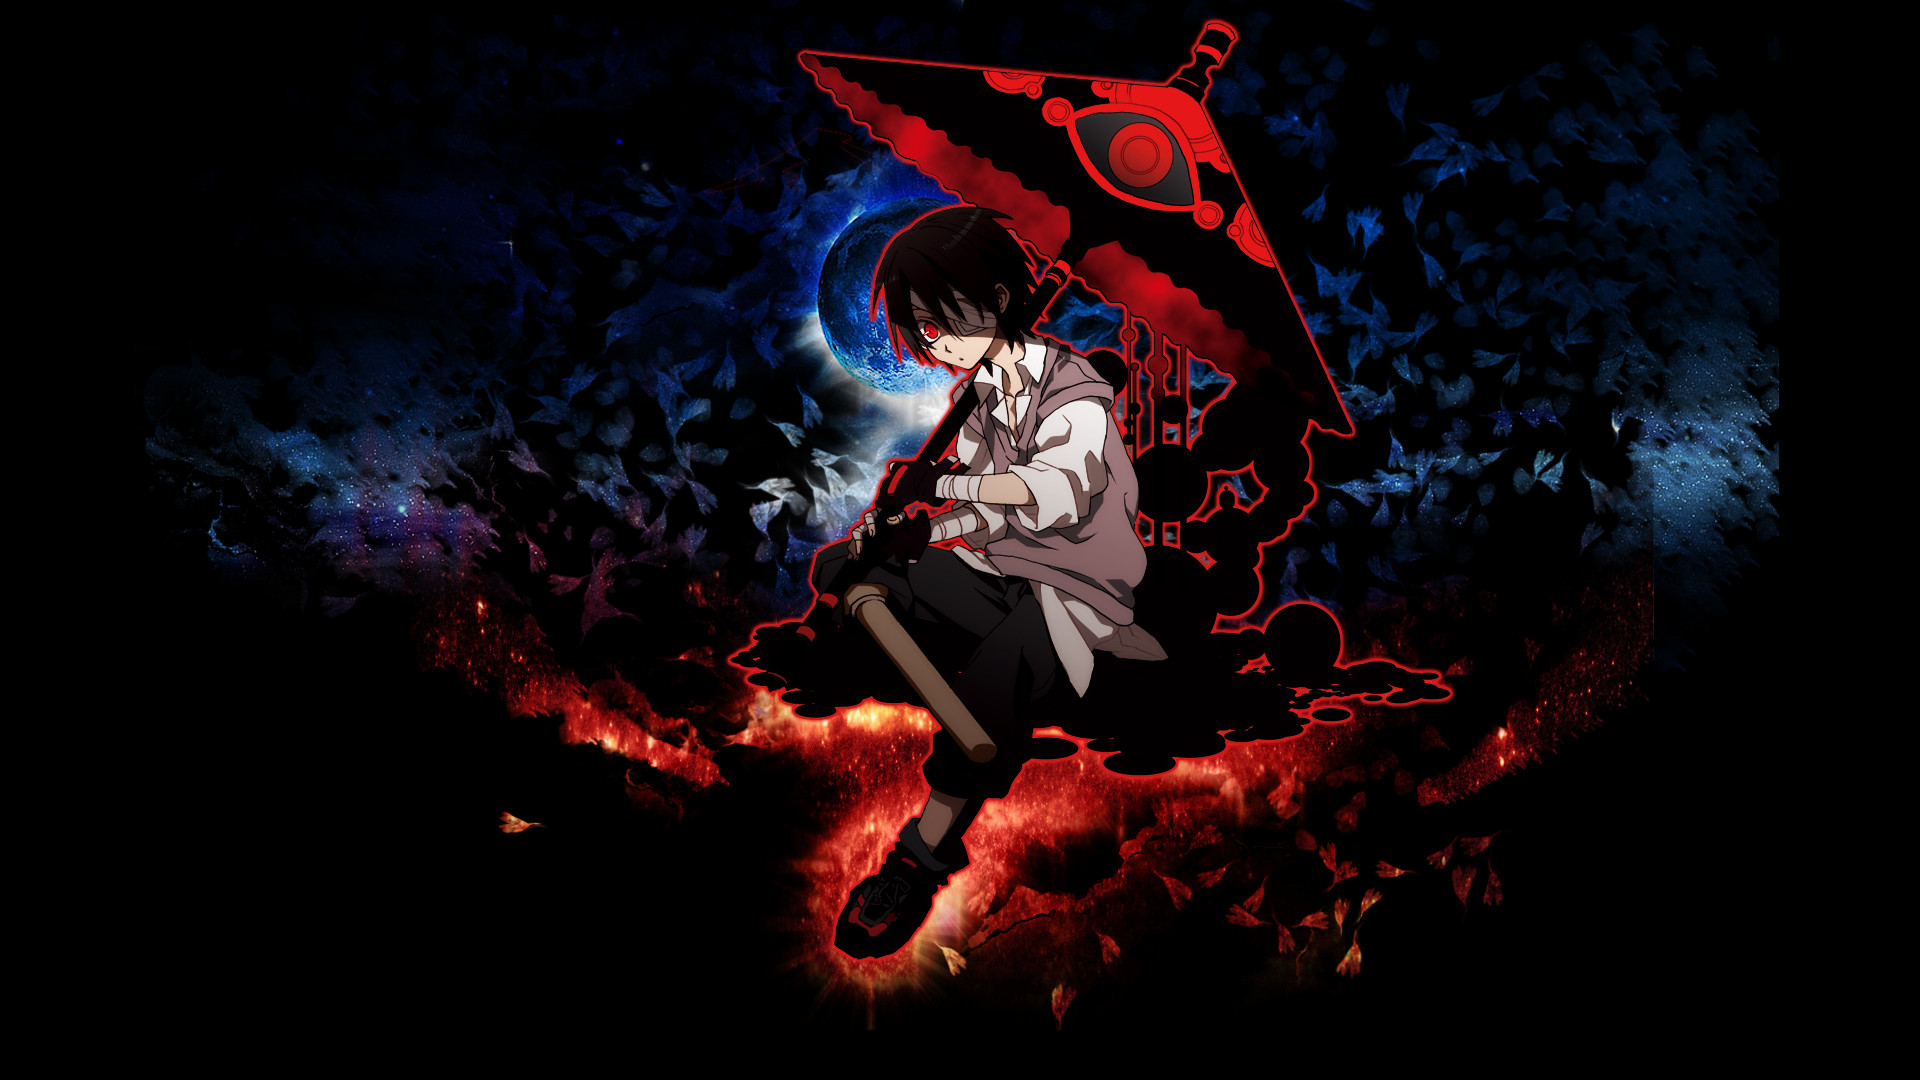 3840x2163 anime 4k hd full screen wallpaper resolution: Anime Wallpaper 2018 (76+ pictures)